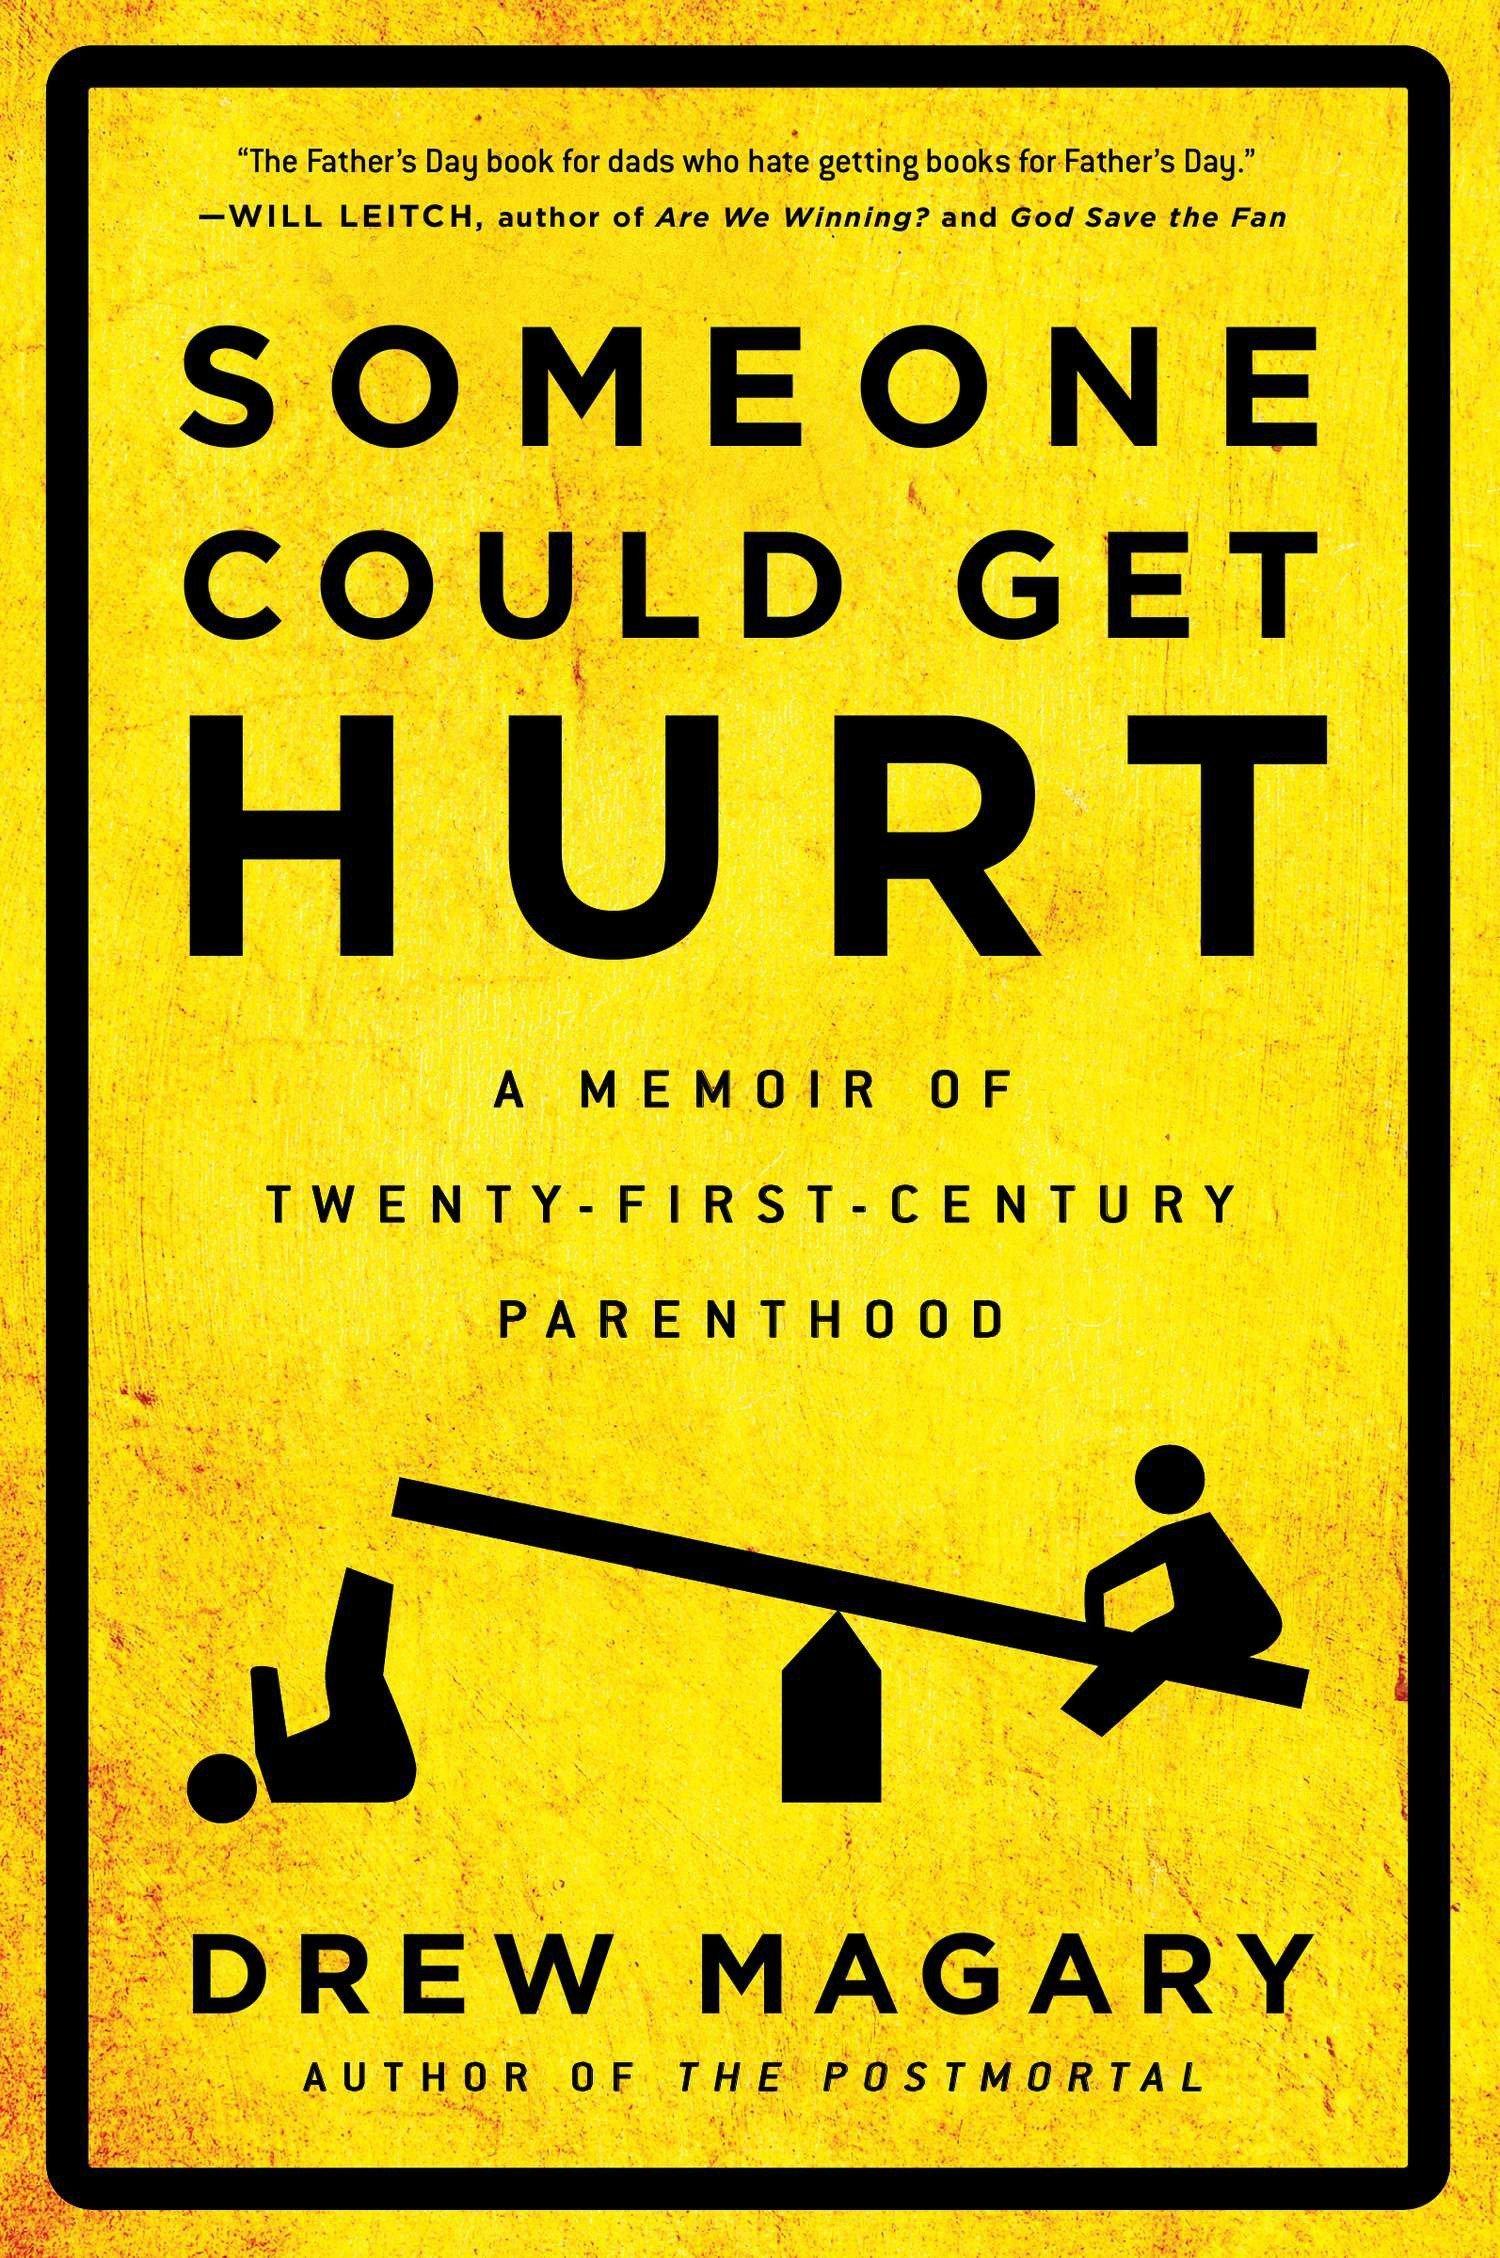 Someone Could Get Hurt: A Memoir of Twenty-First-Century Parenthood: Drew  Magary: 9781592408764: Amazon.com: Books